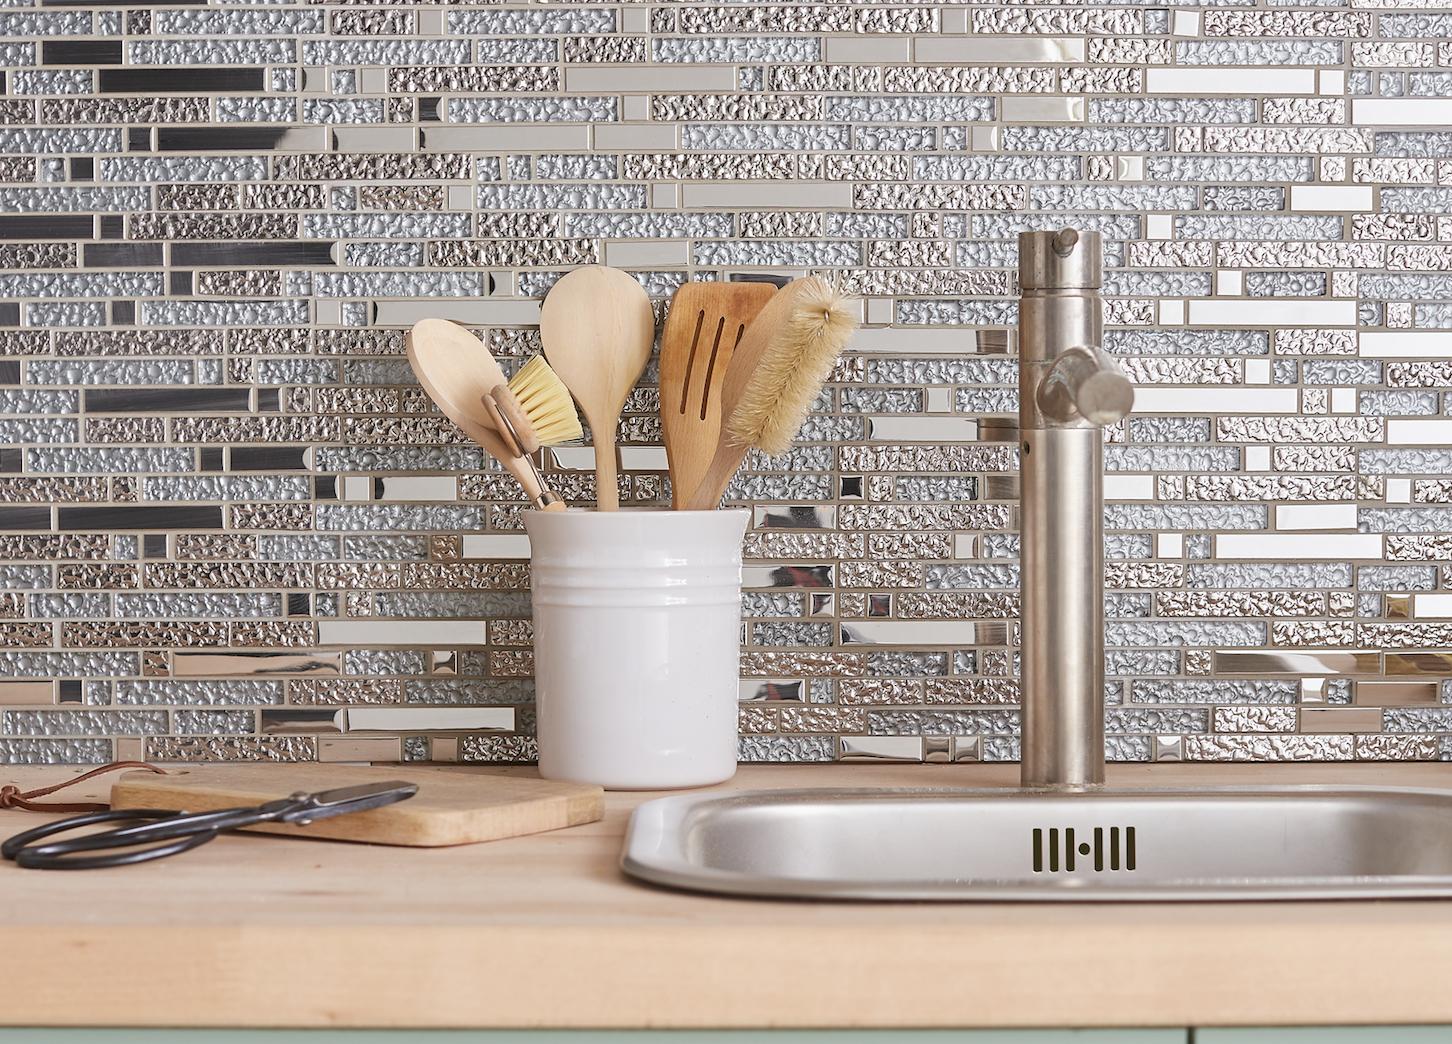 Mur de cuisine en mosaïque